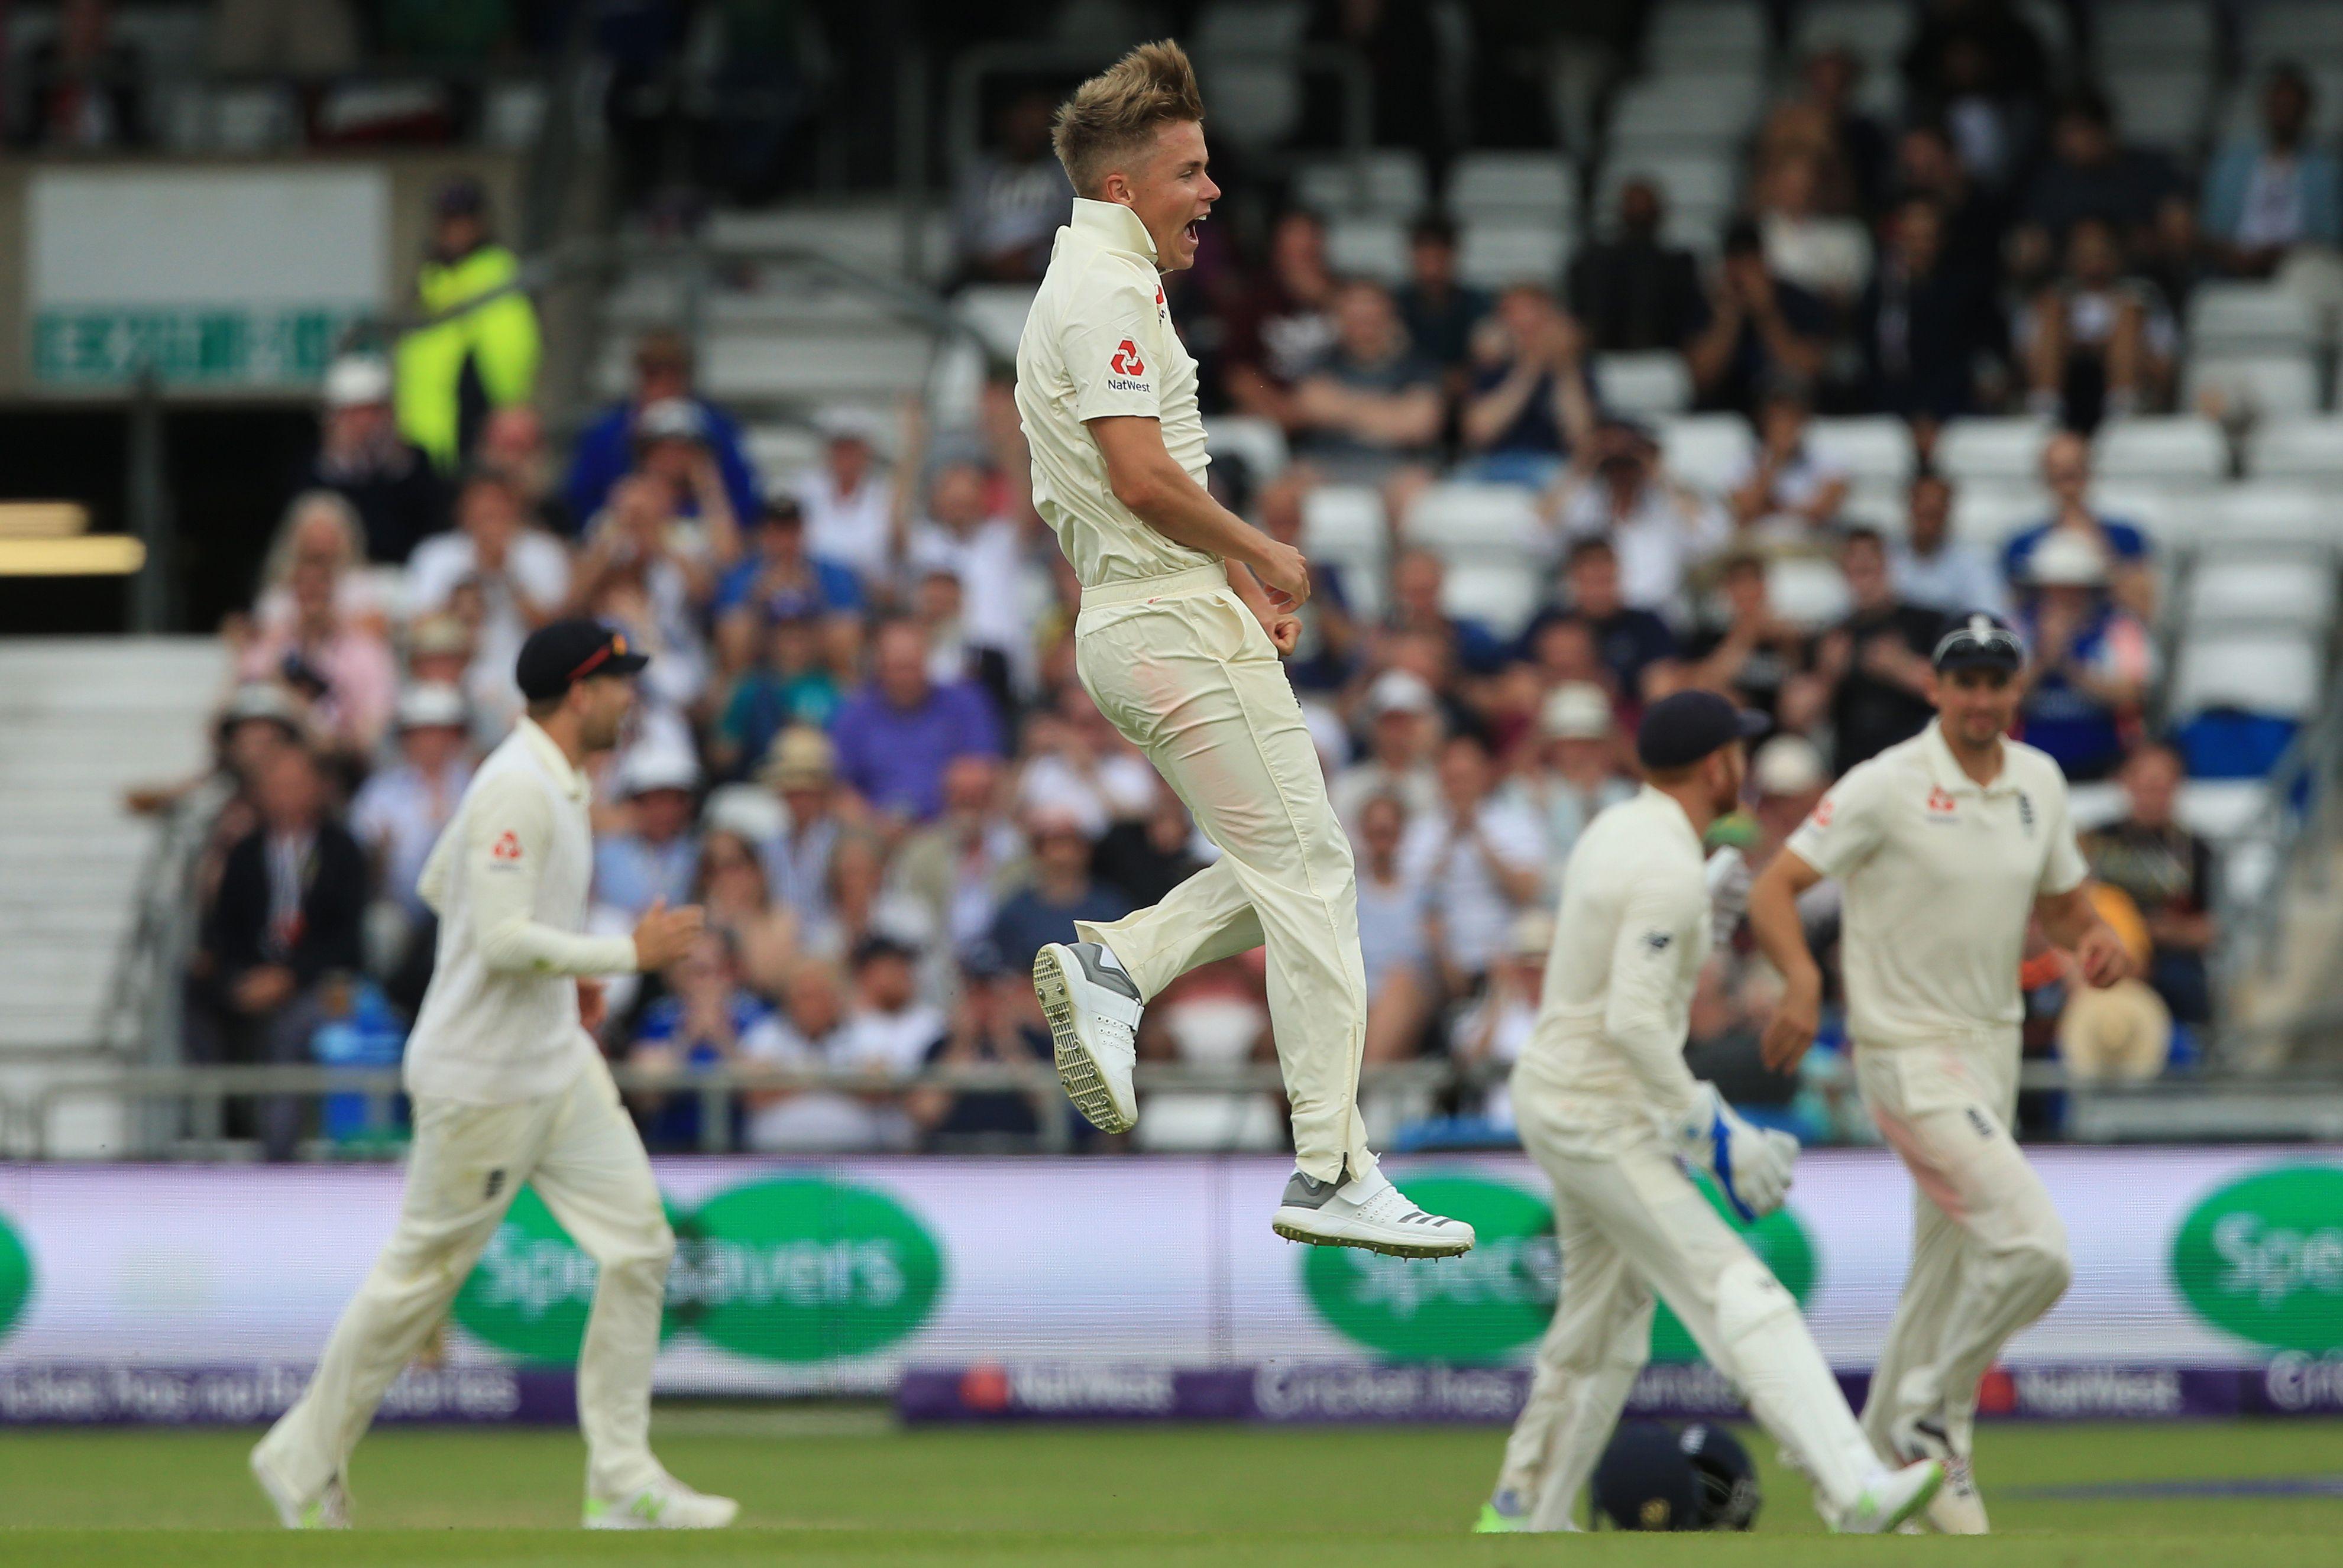 Birthday boy Sam Curran was also in the wickets on an eventful day three